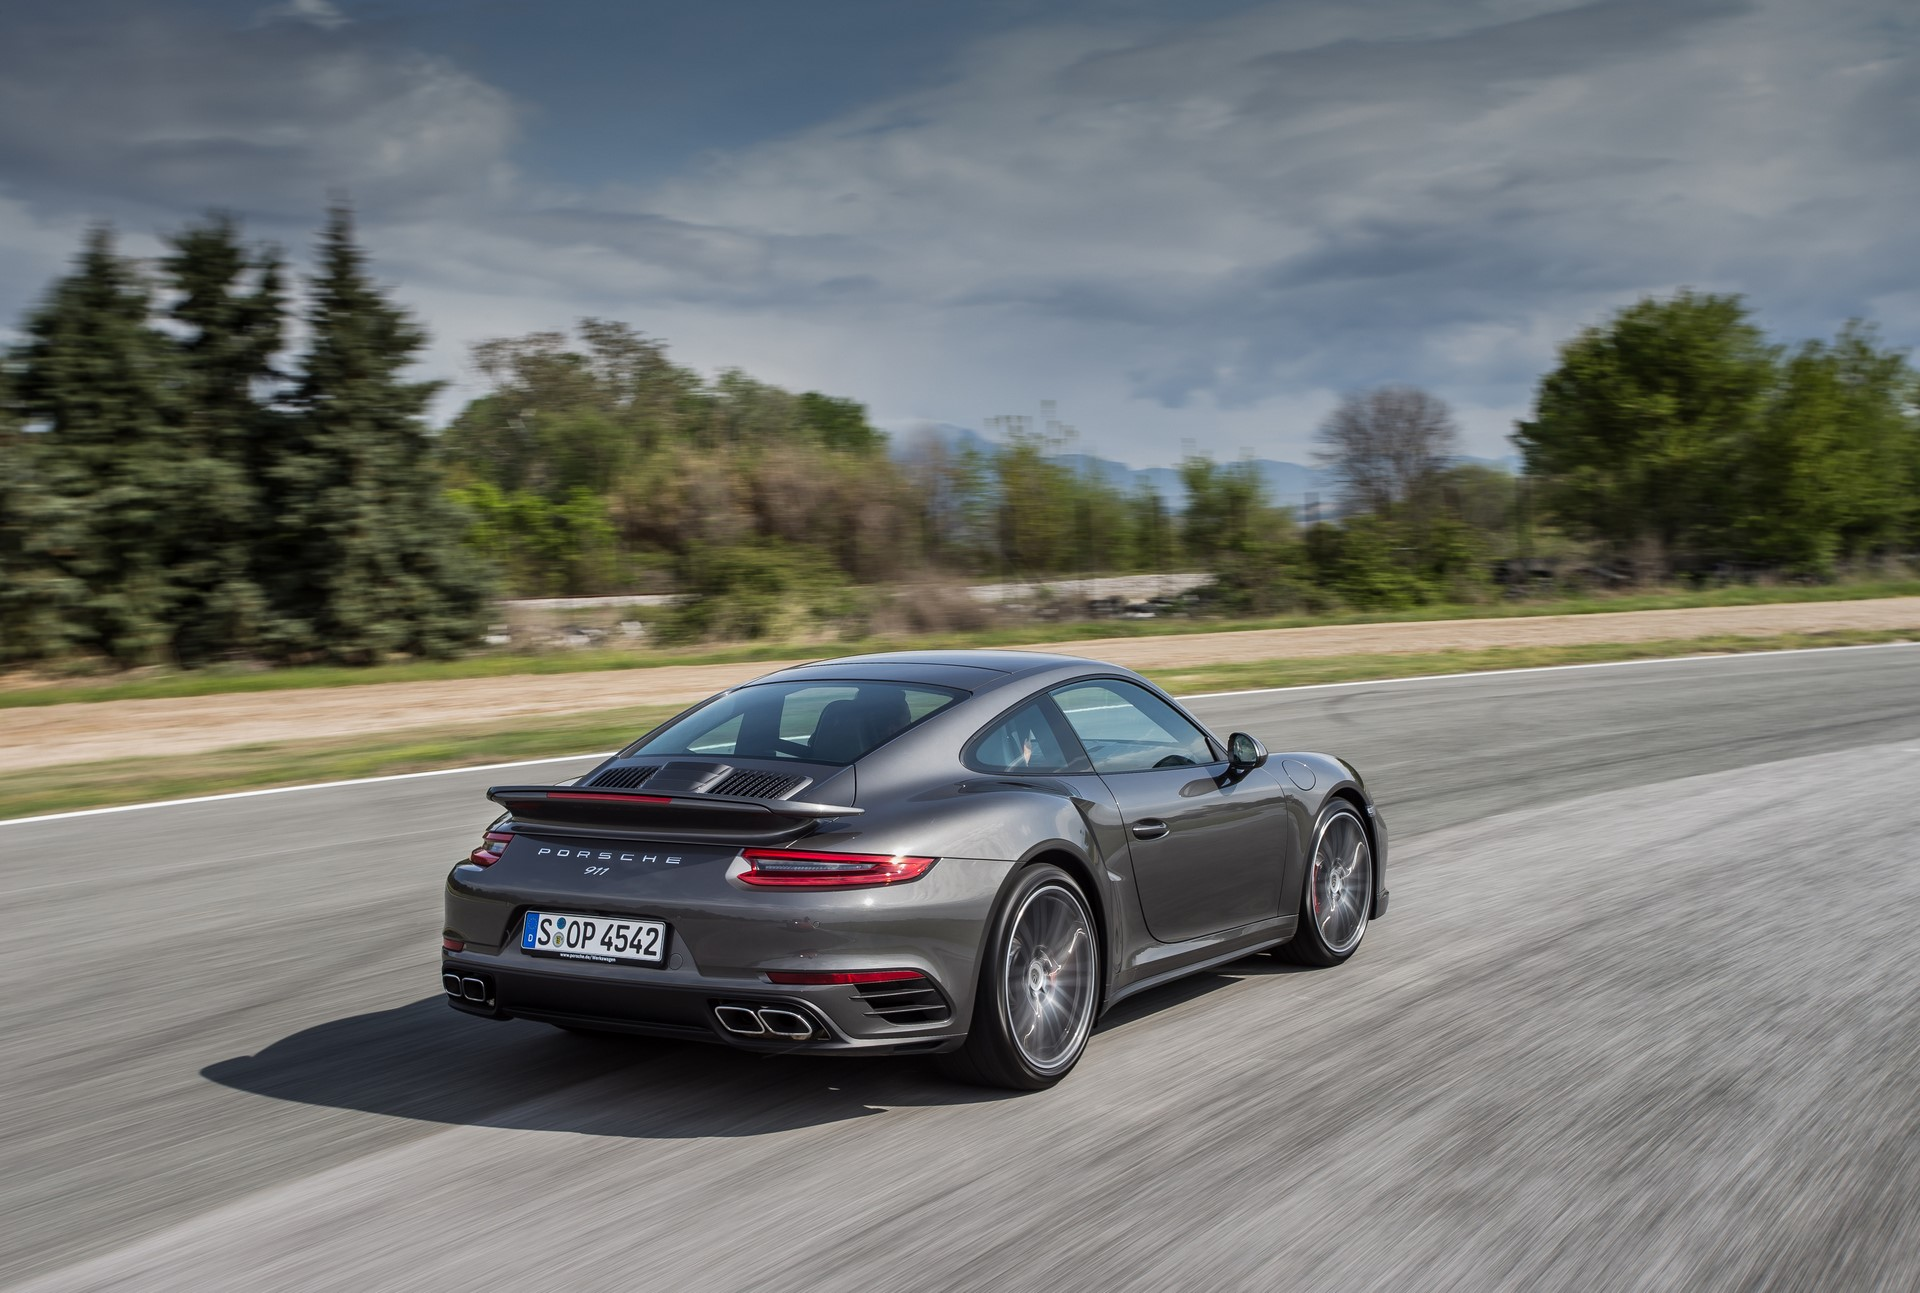 Porsche Driving Experience 2017 Serres (27)